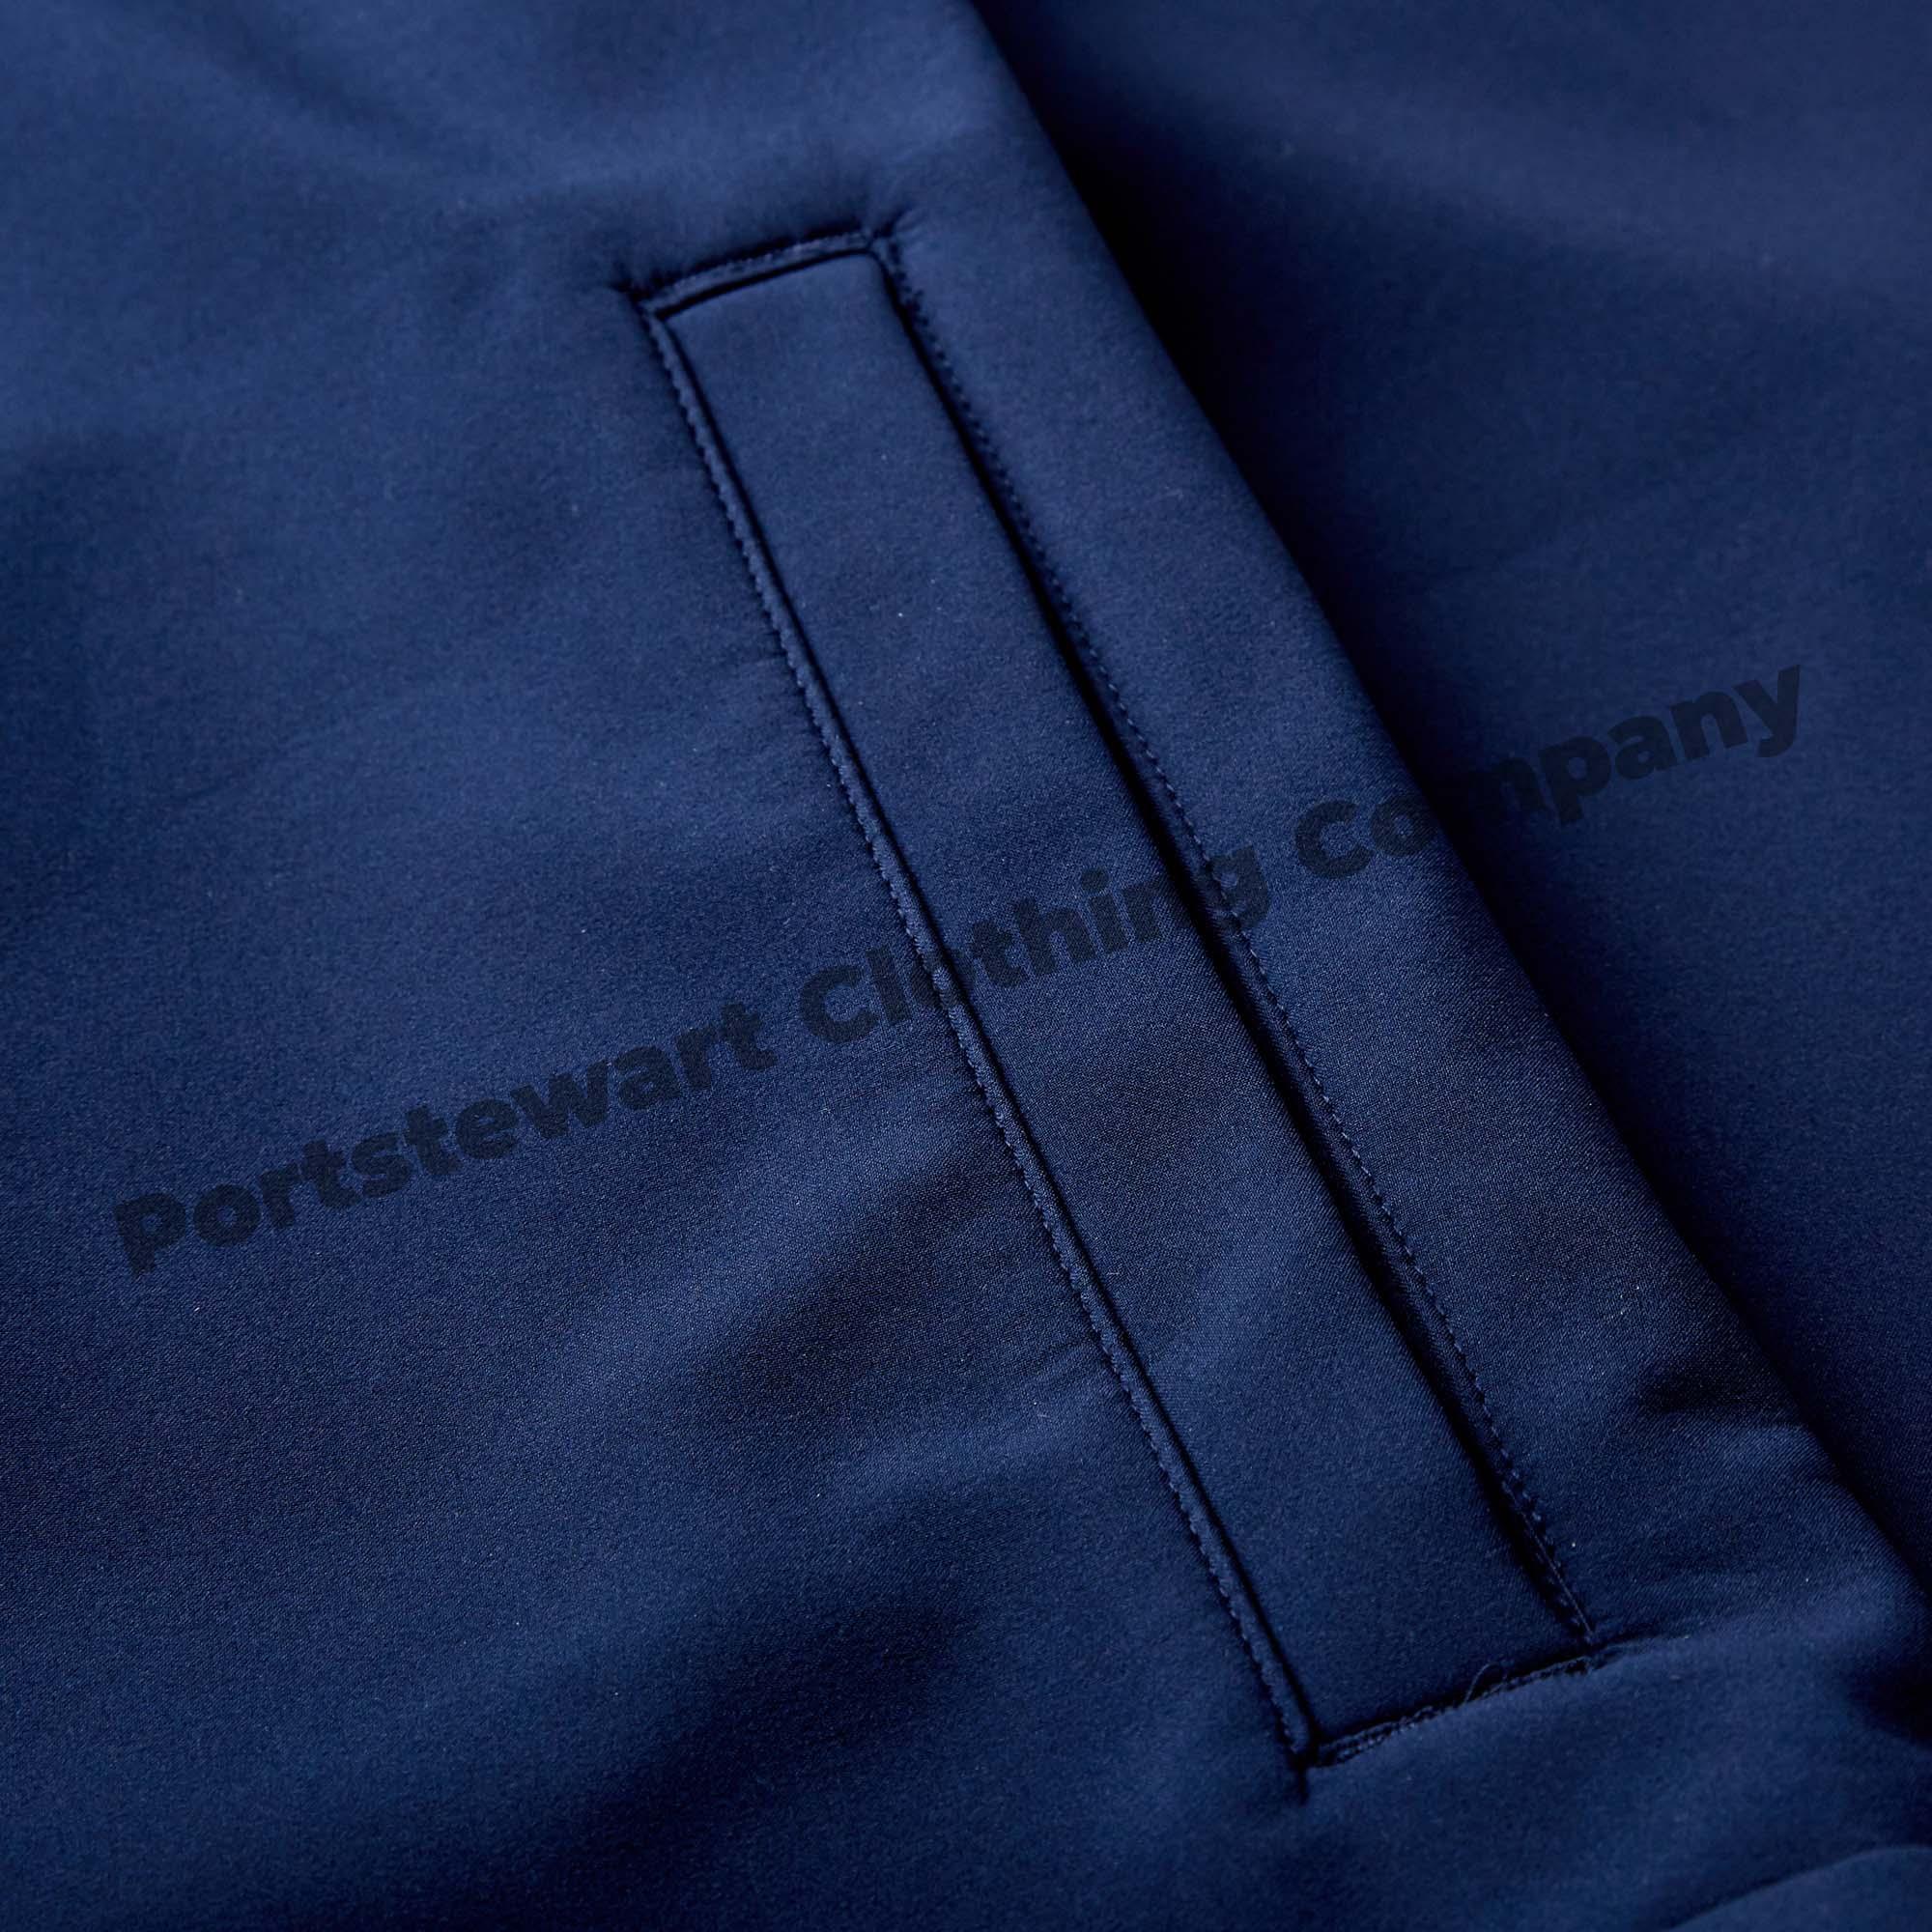 Regatta-Mens-Soft-Shell-Windproof-Workwear-Softshell-Jacket-Coat-RRP-50 thumbnail 11